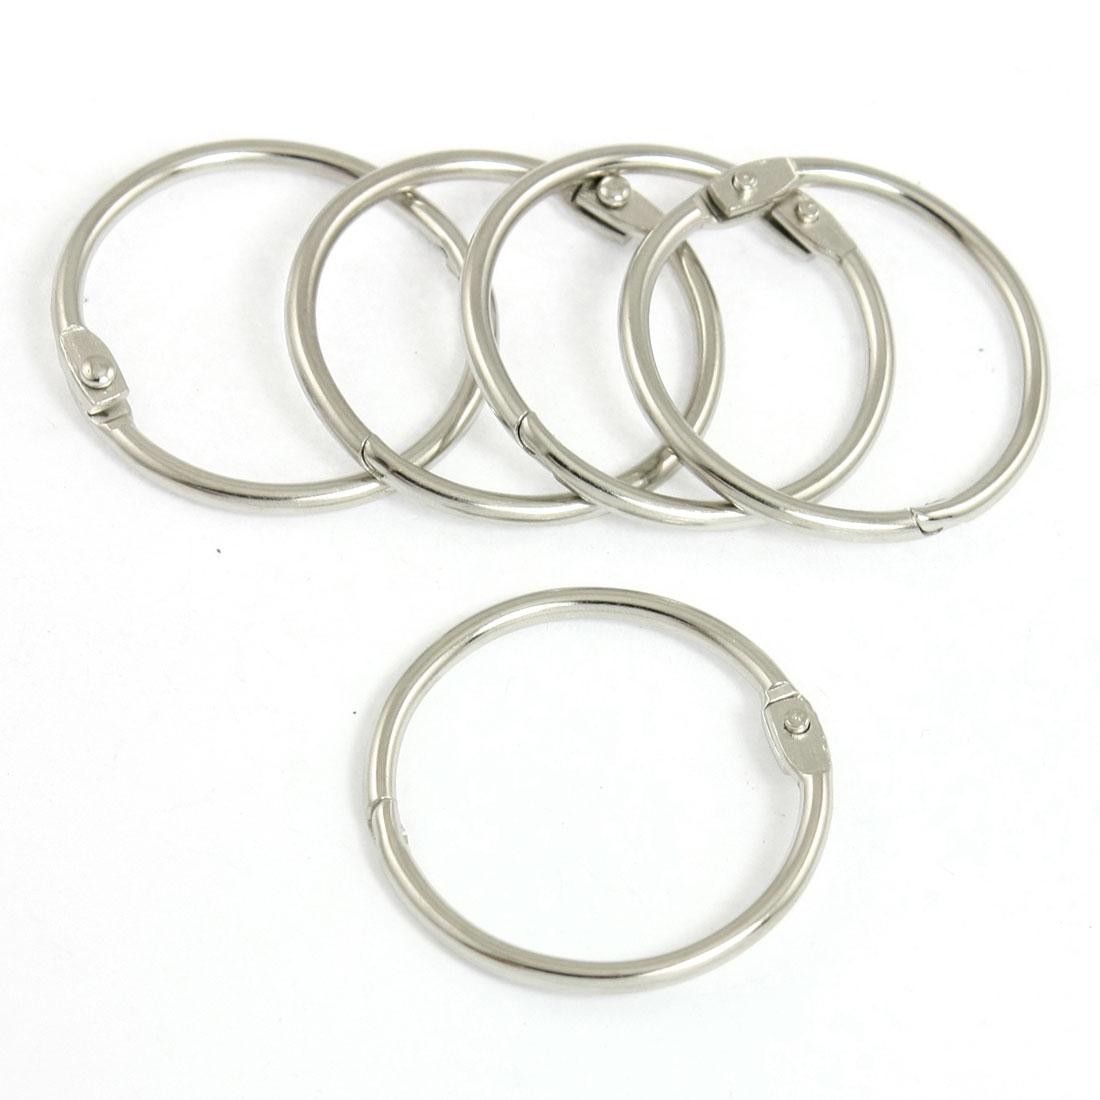 5 Pcs Silver Tone Metal Clip Design Key Chain Keyring 3.2cm Dia